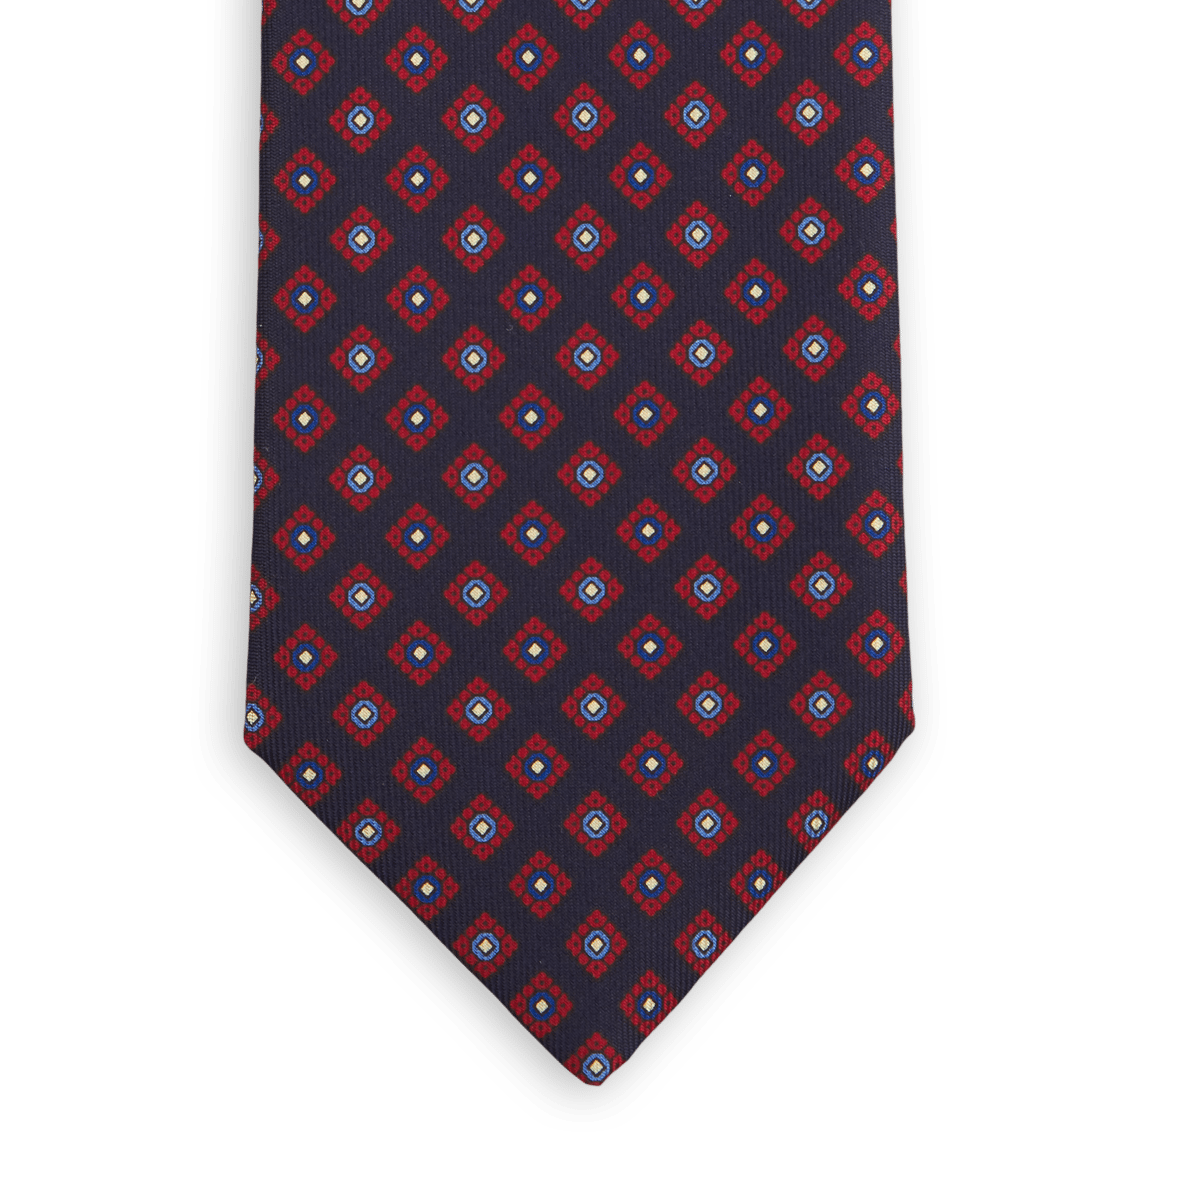 E.Marinella Navy Geometric Printed Silk Tie Front